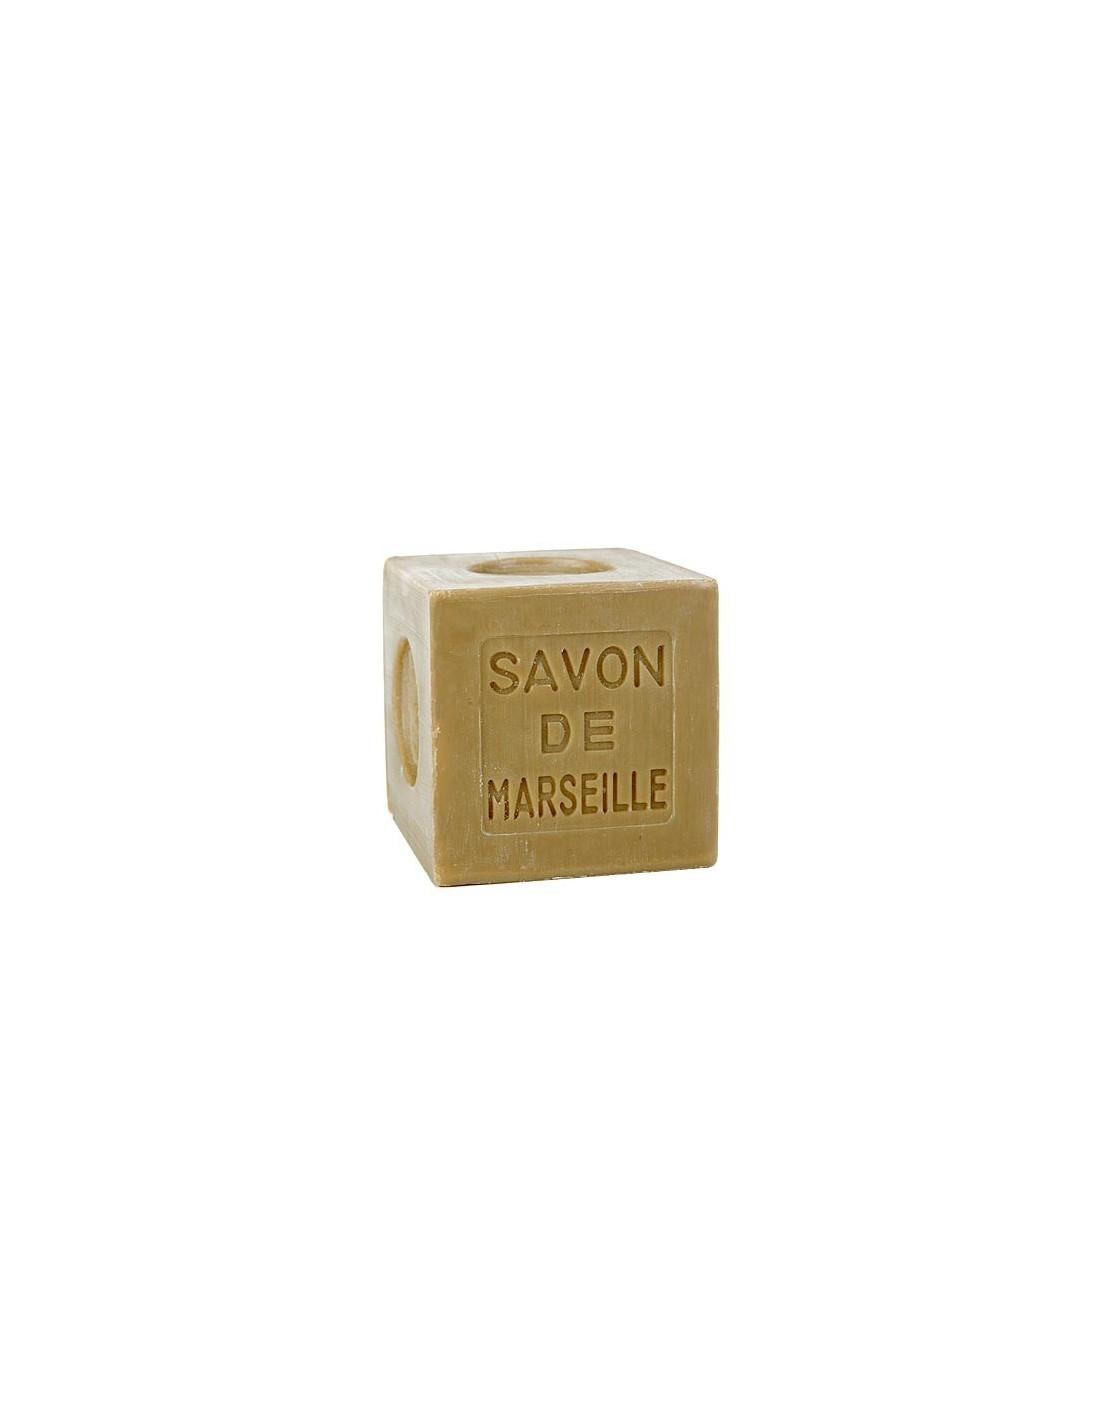 gr ne w rfelseife 72 savon de marseille nature marius fabre oliven l 400 g. Black Bedroom Furniture Sets. Home Design Ideas